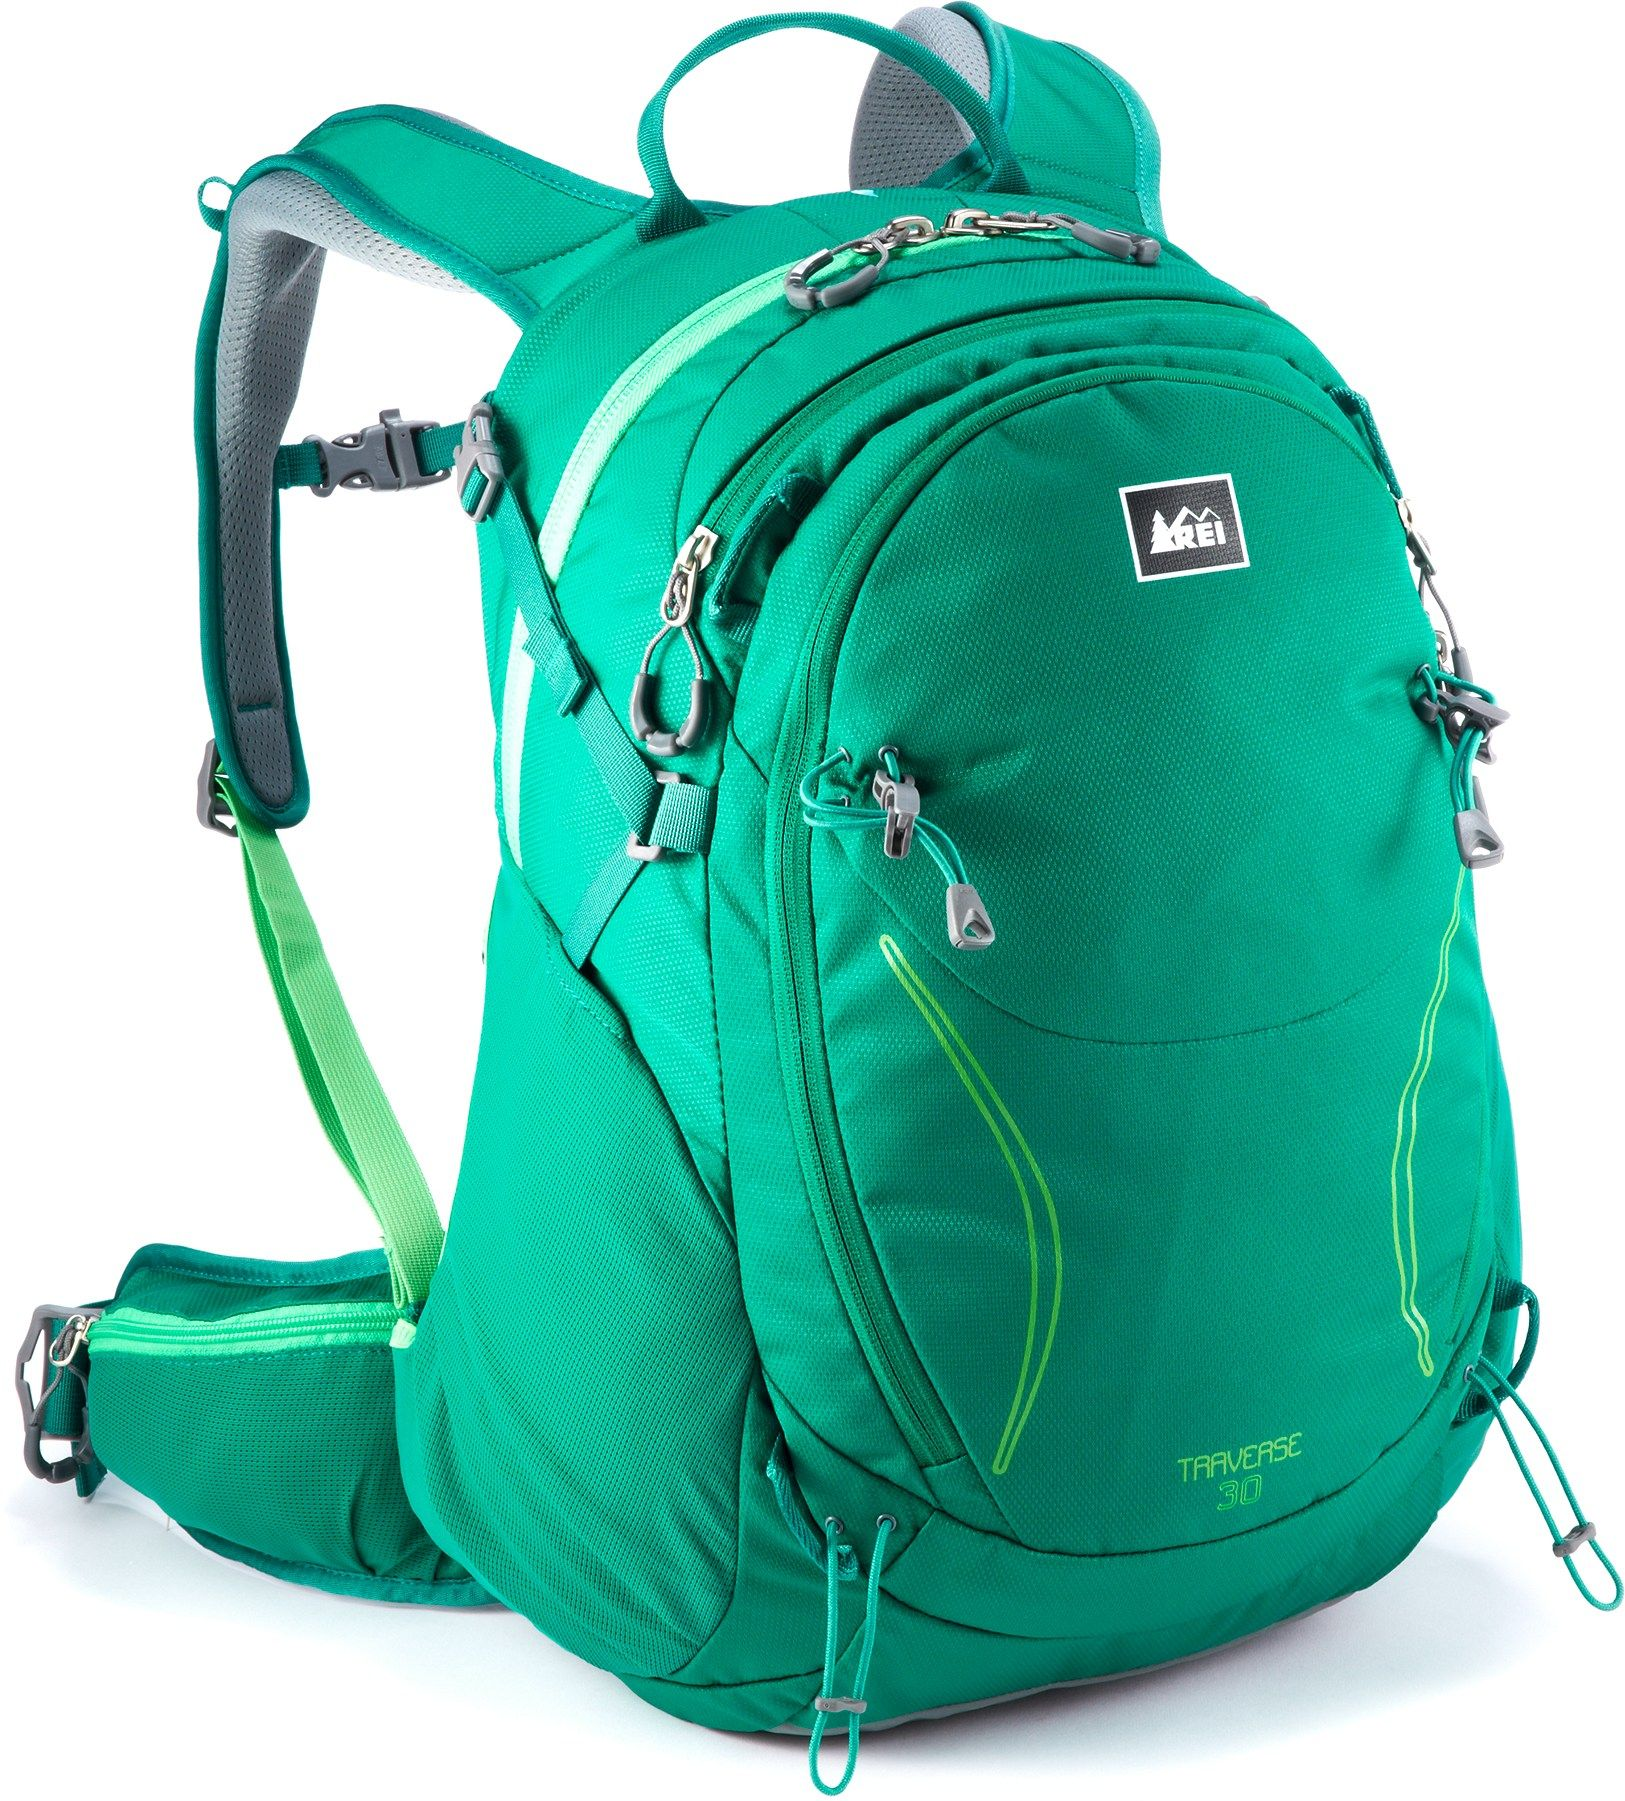 b21b6da80396 REI Traverse 30 Pack - Women s - Special Buy - REI.com